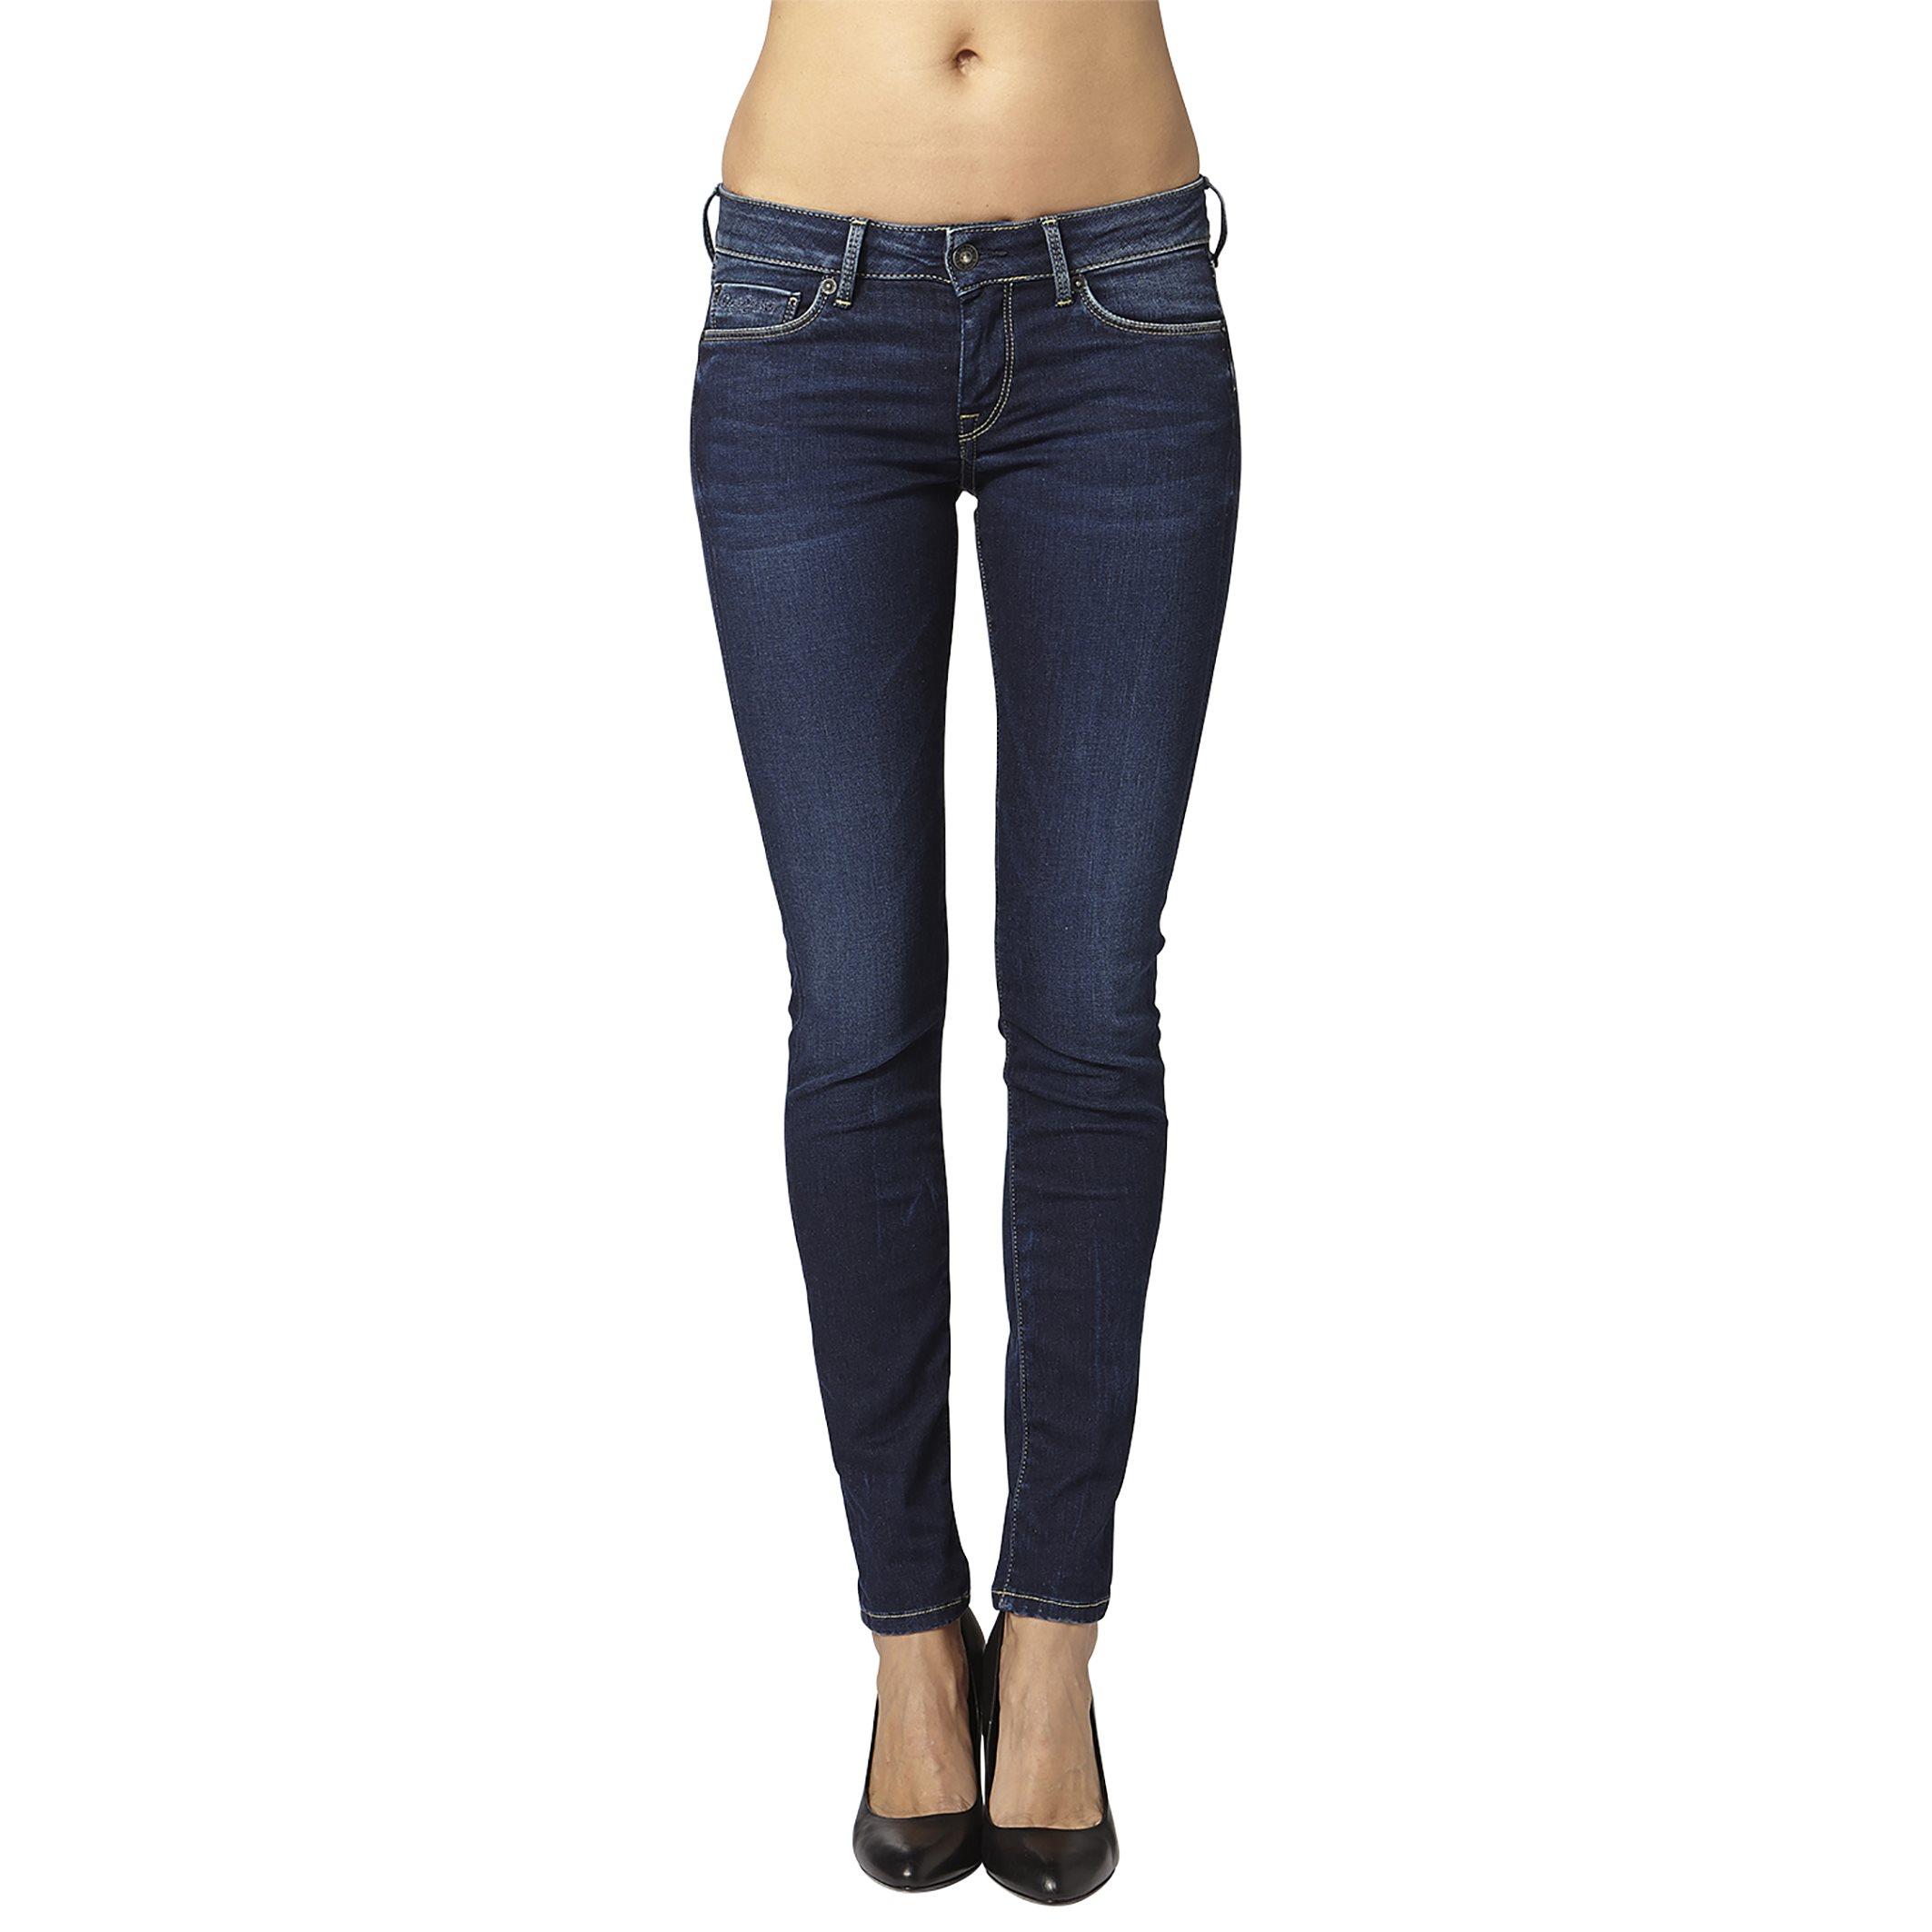 pepe jeans soho slim fit jeans in blue lyst. Black Bedroom Furniture Sets. Home Design Ideas